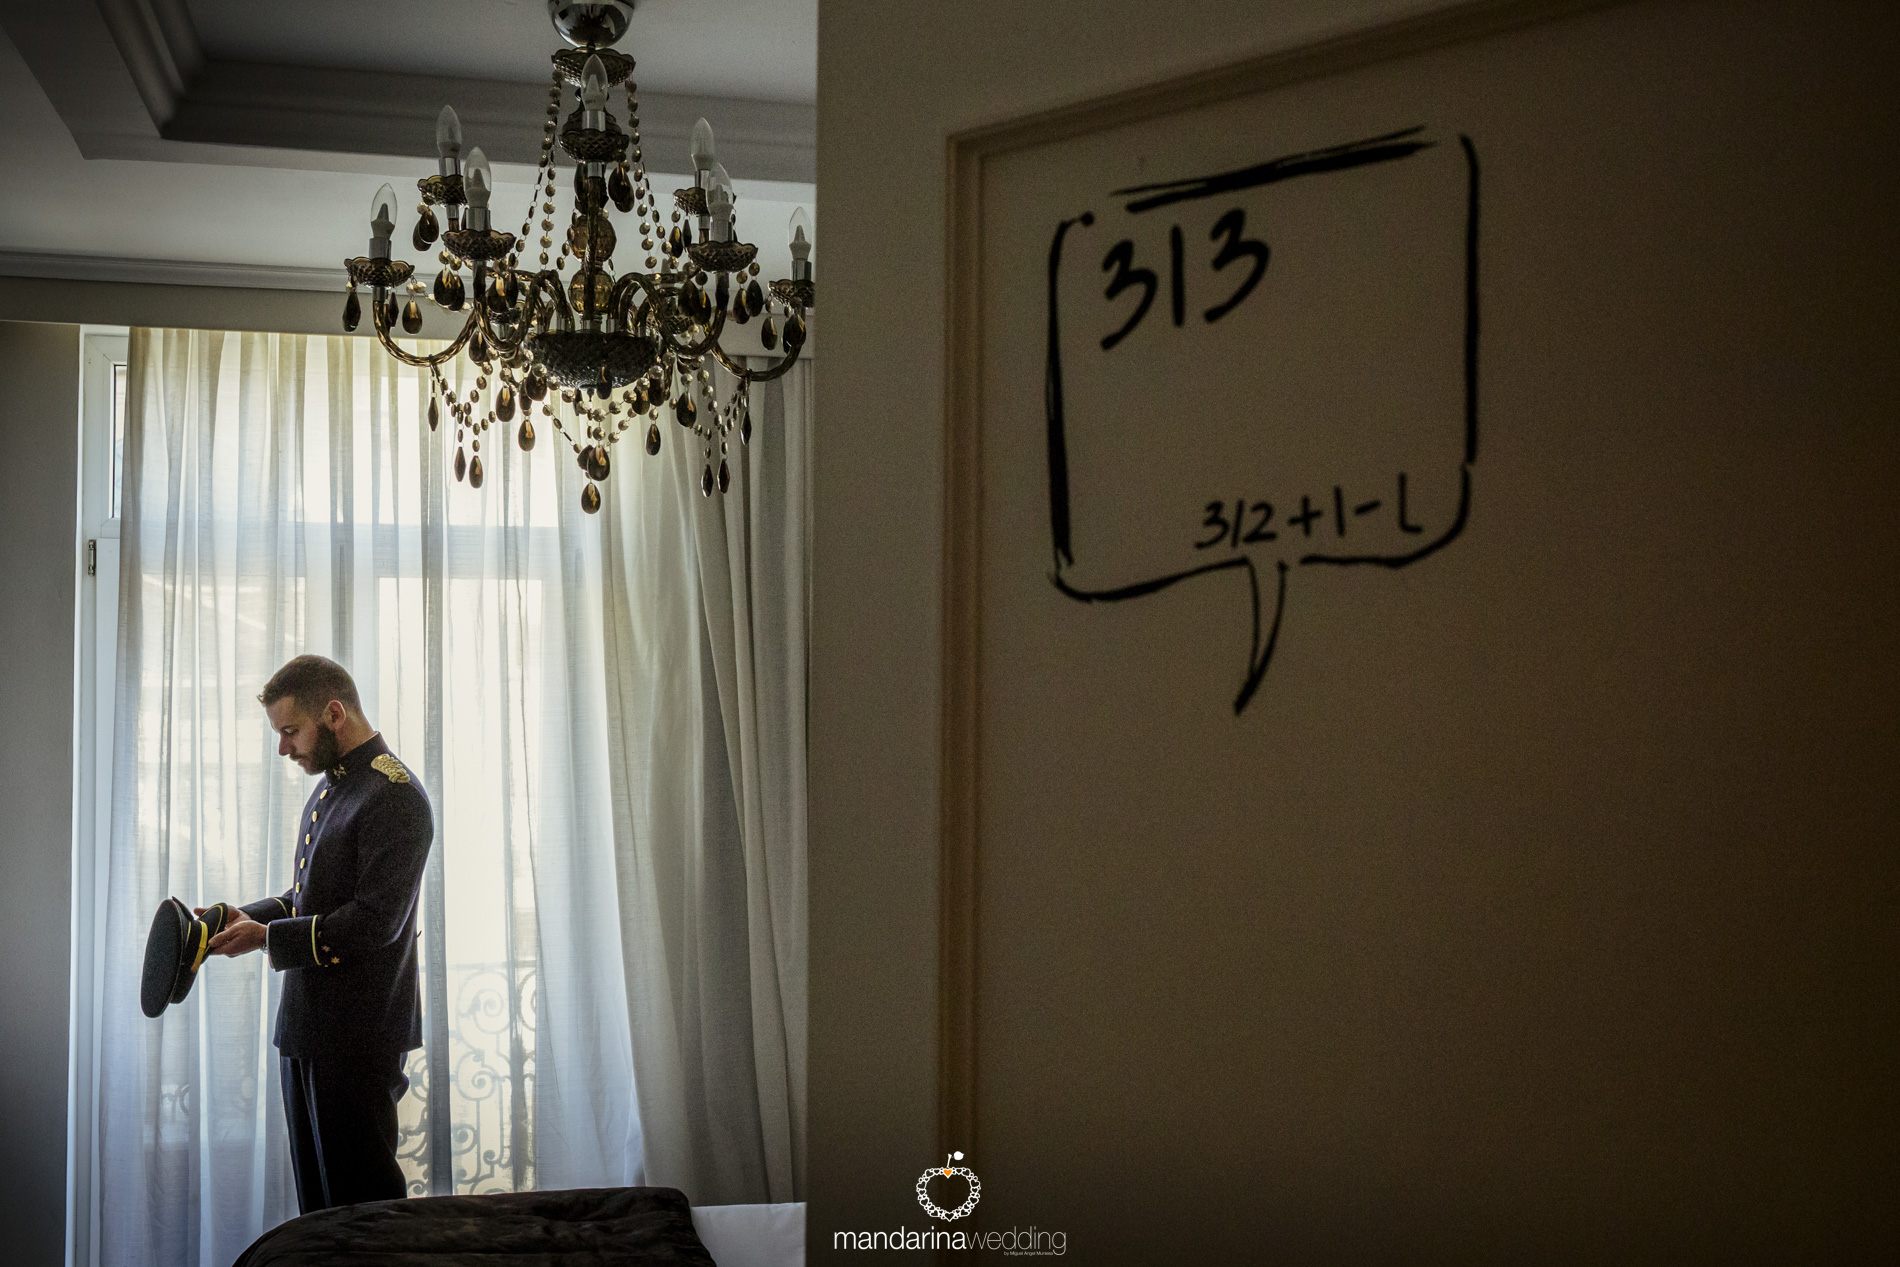 mandarina wedding, fotografos de boda, fotografo boda soria, fotografo boda barcelona, fotografo boda Madrid, fotógrafo boda lerida_22